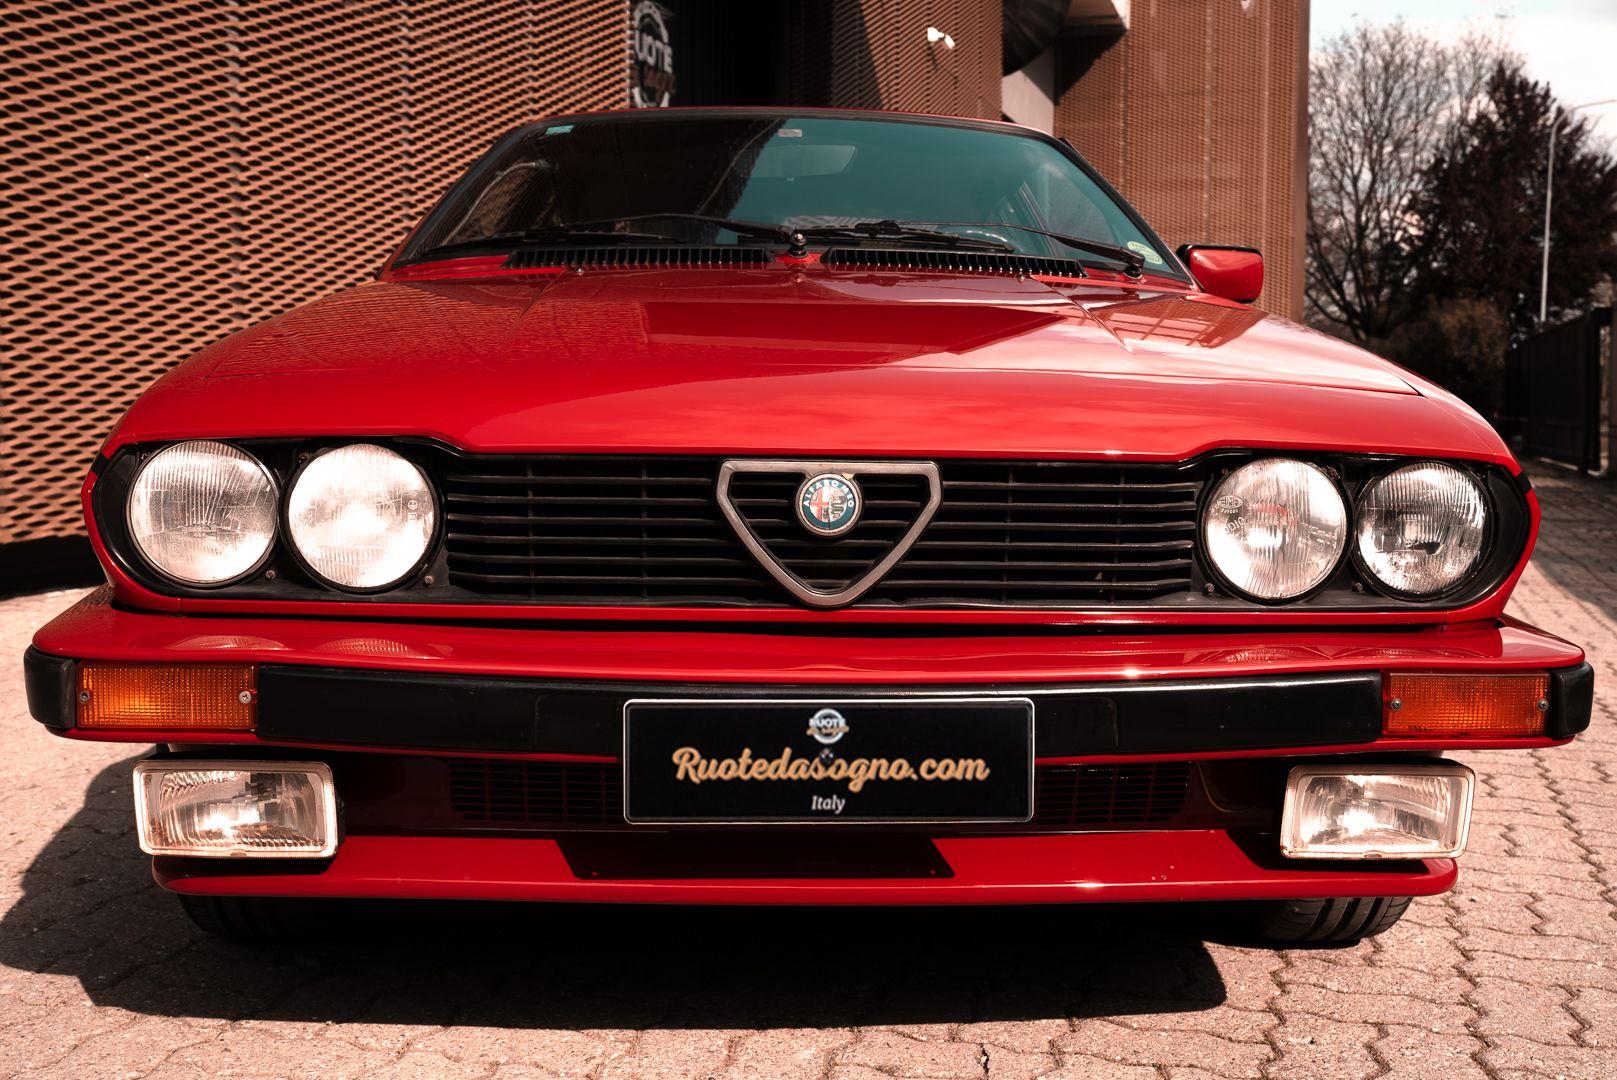 1981 Alfa Romeo Alfetta GTV Gran Prix n.128 68556